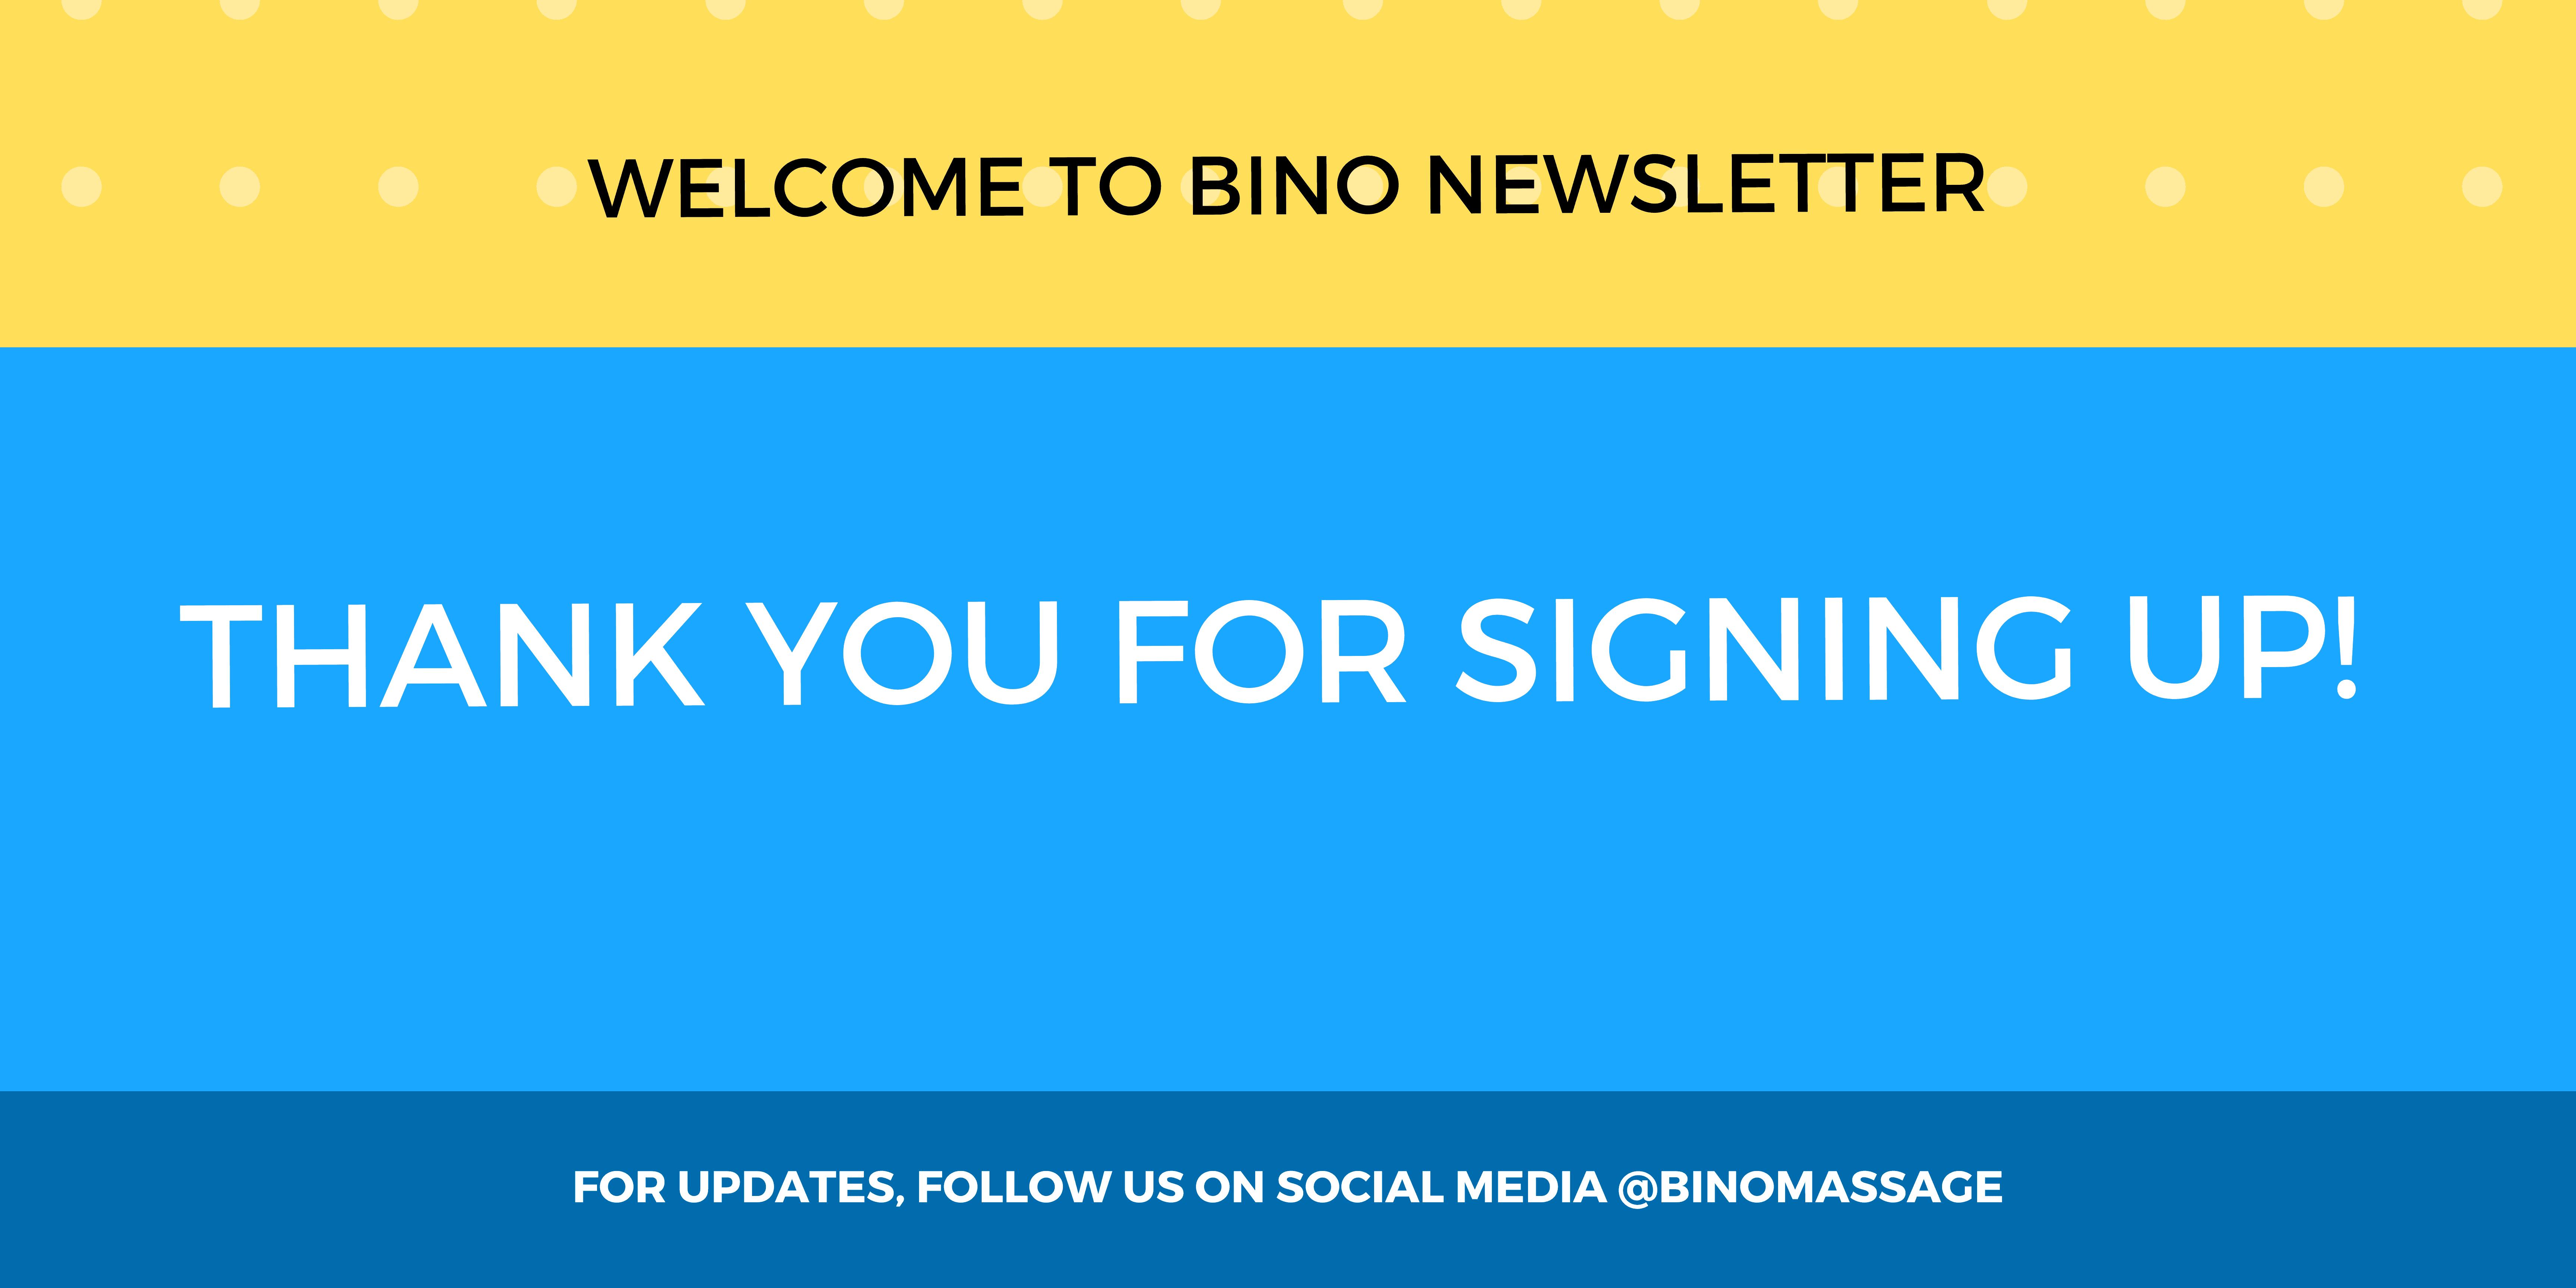 Newsletter subscriber